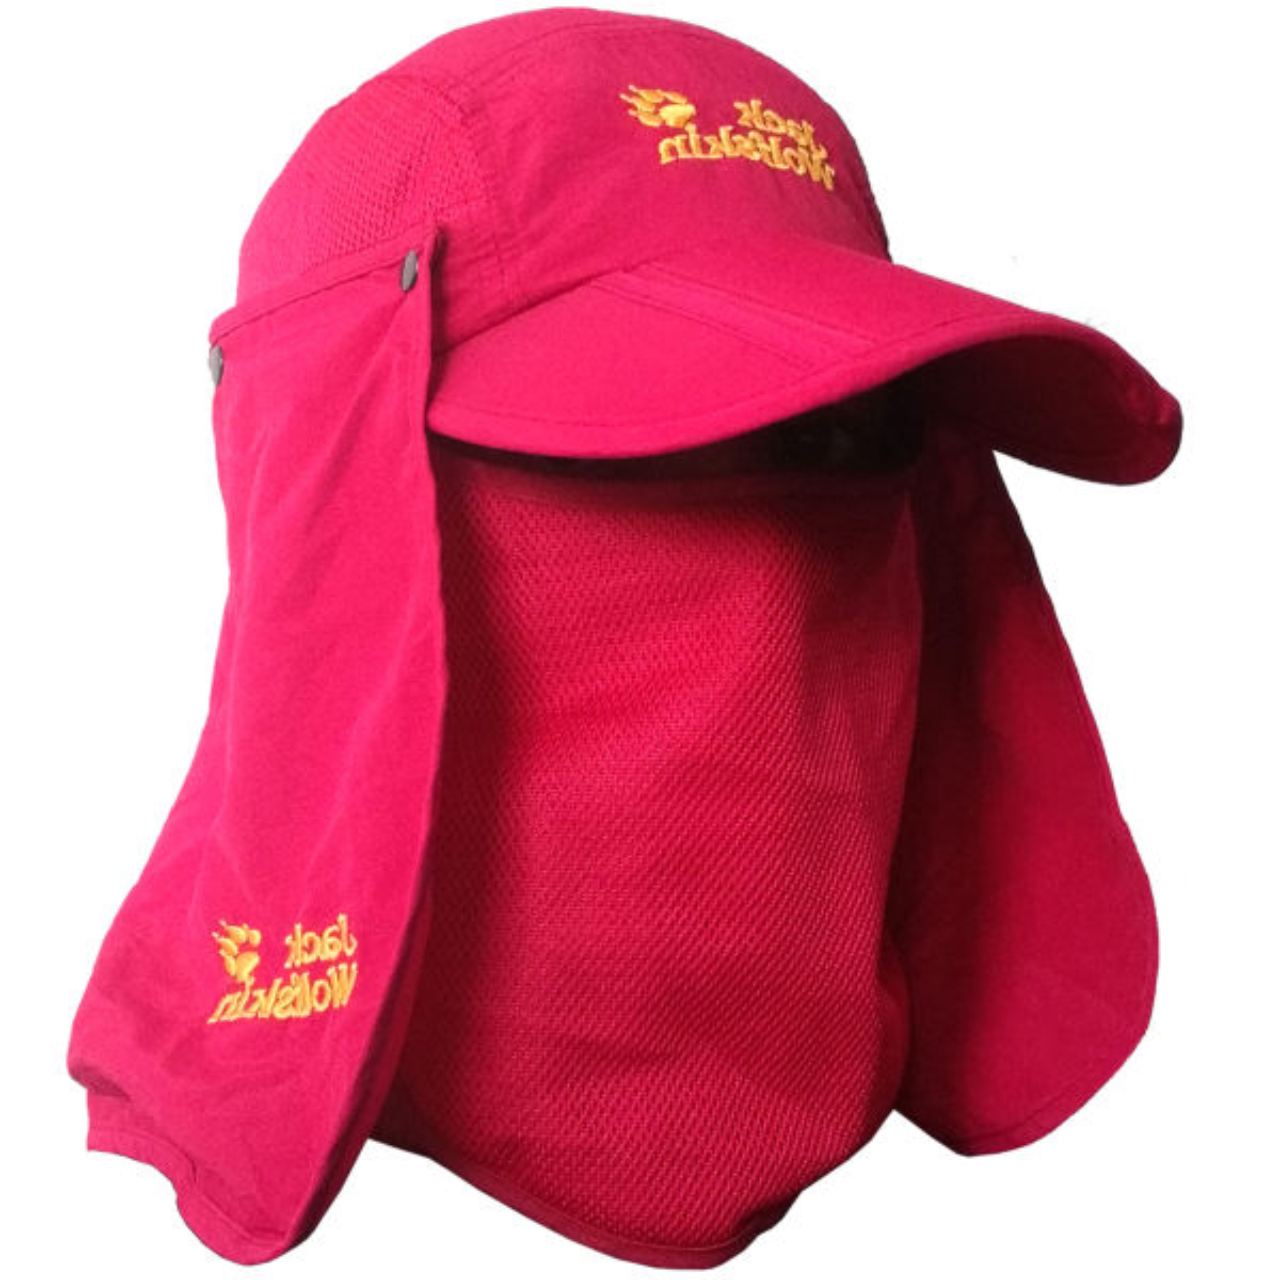 کلاه کوهنوردی جک ولف اسکین مدل 011 سایز M/L